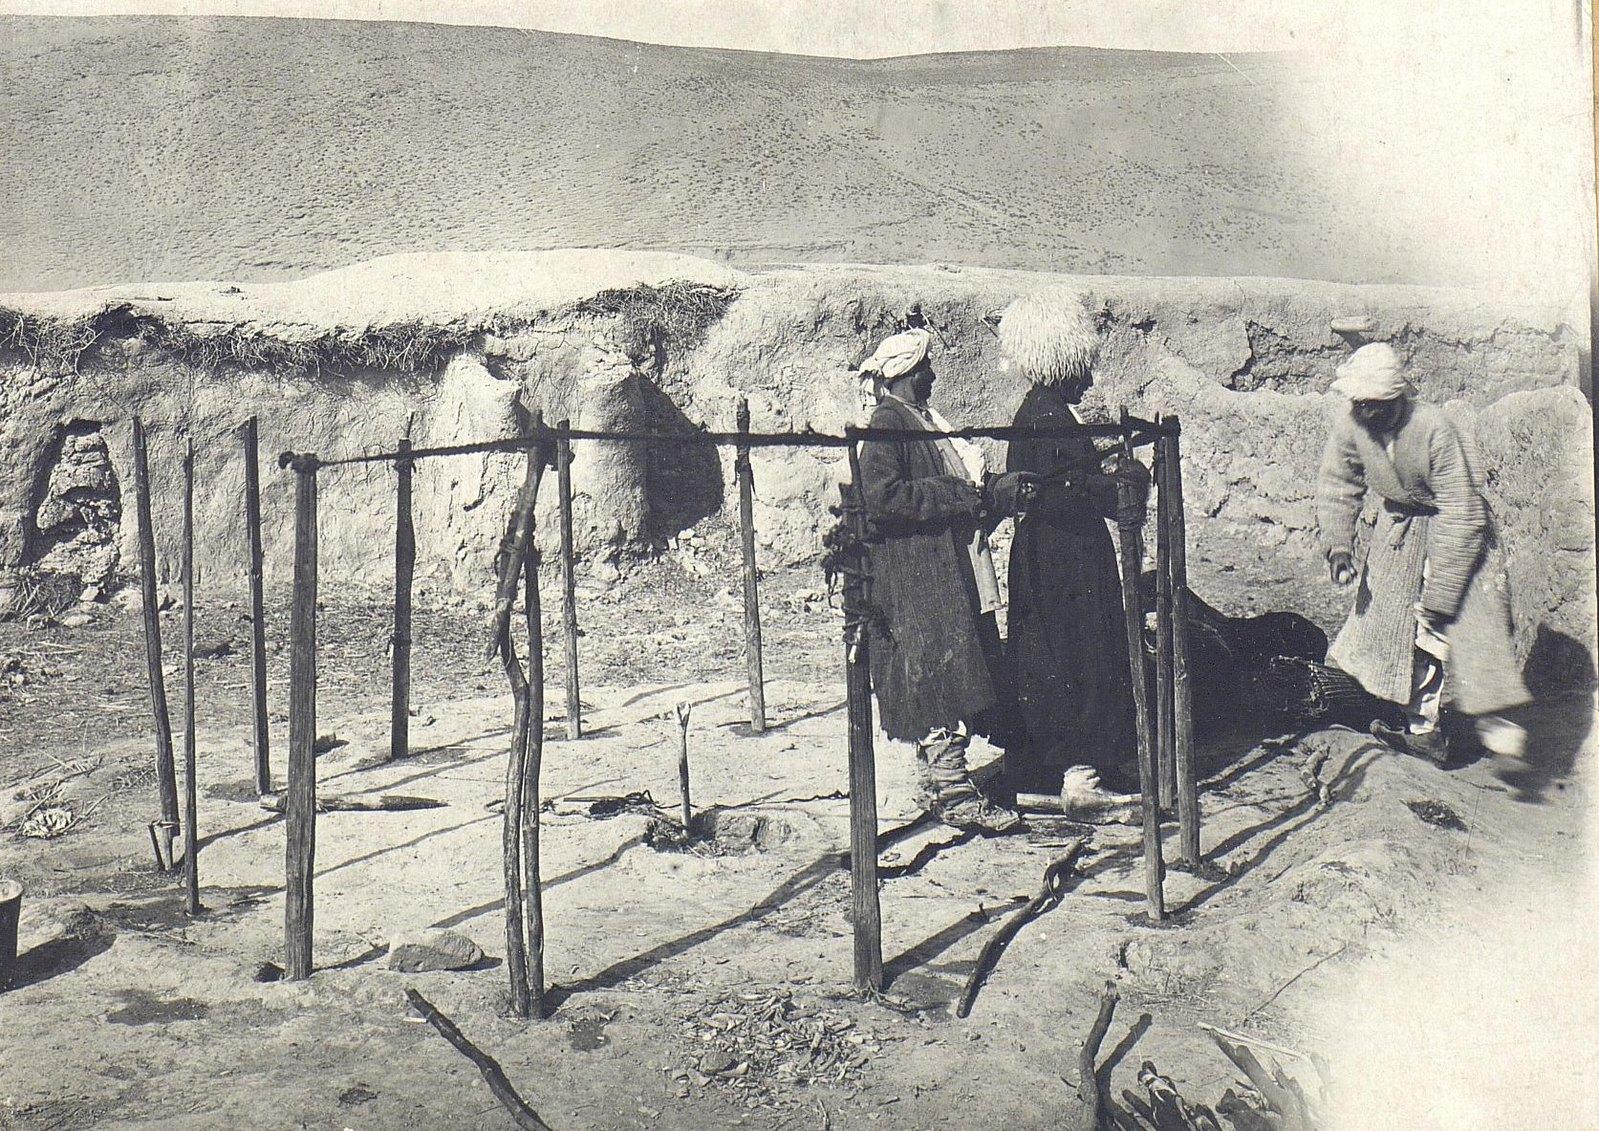 Установка чаппари живущими в кишлаке Сеид-Башура хазарейцами